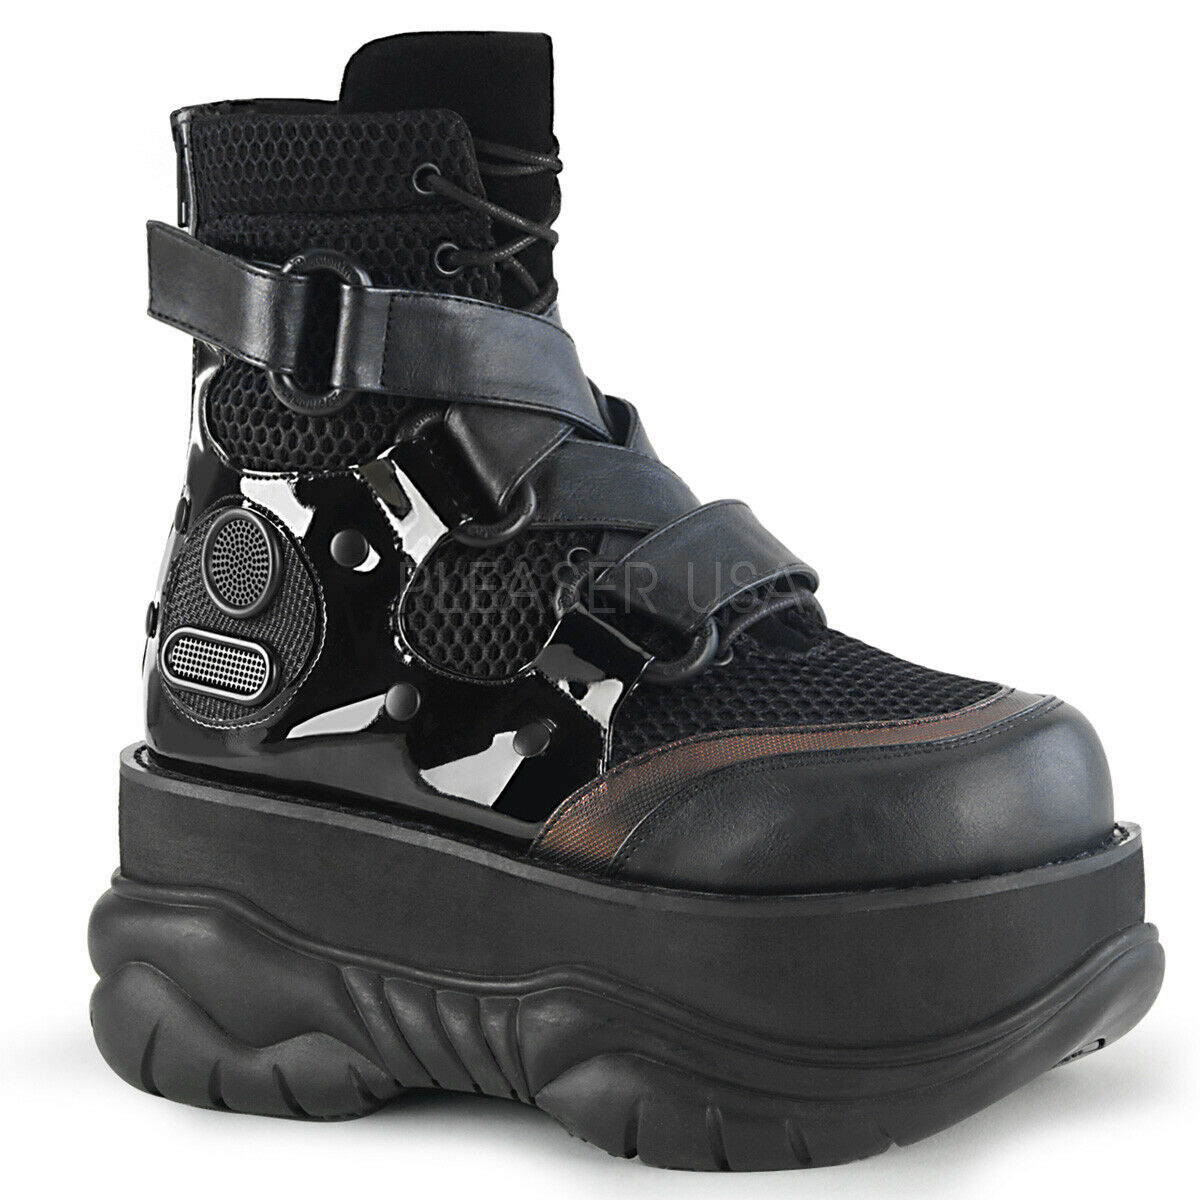 Cyber Punk Goth De Malla Negra Plataforma Tenis botas Mujer Demonia Neptune - 126